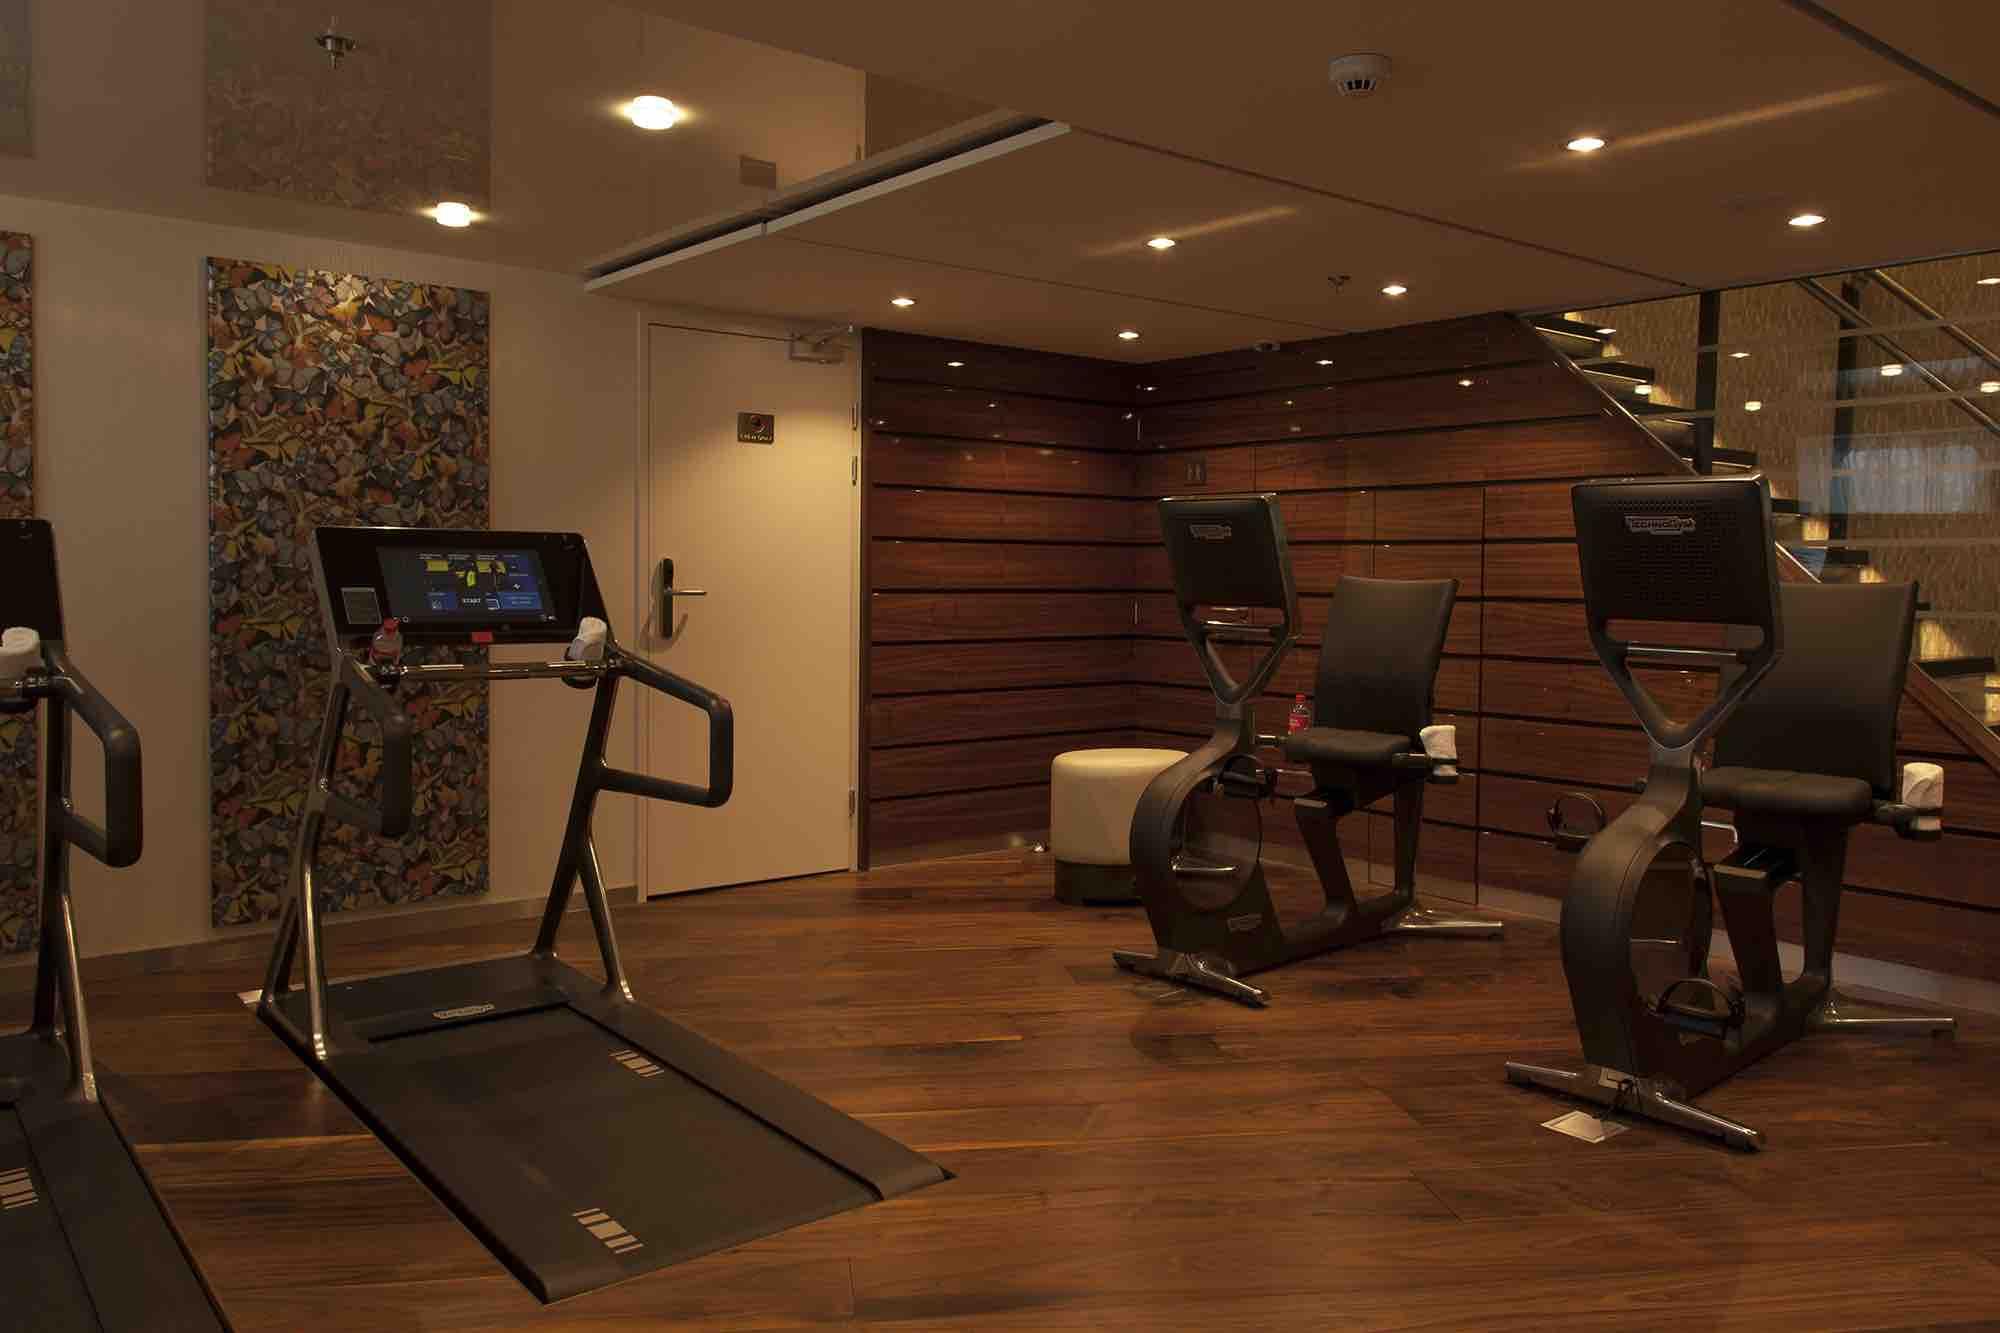 AmaStella Fitnessraum